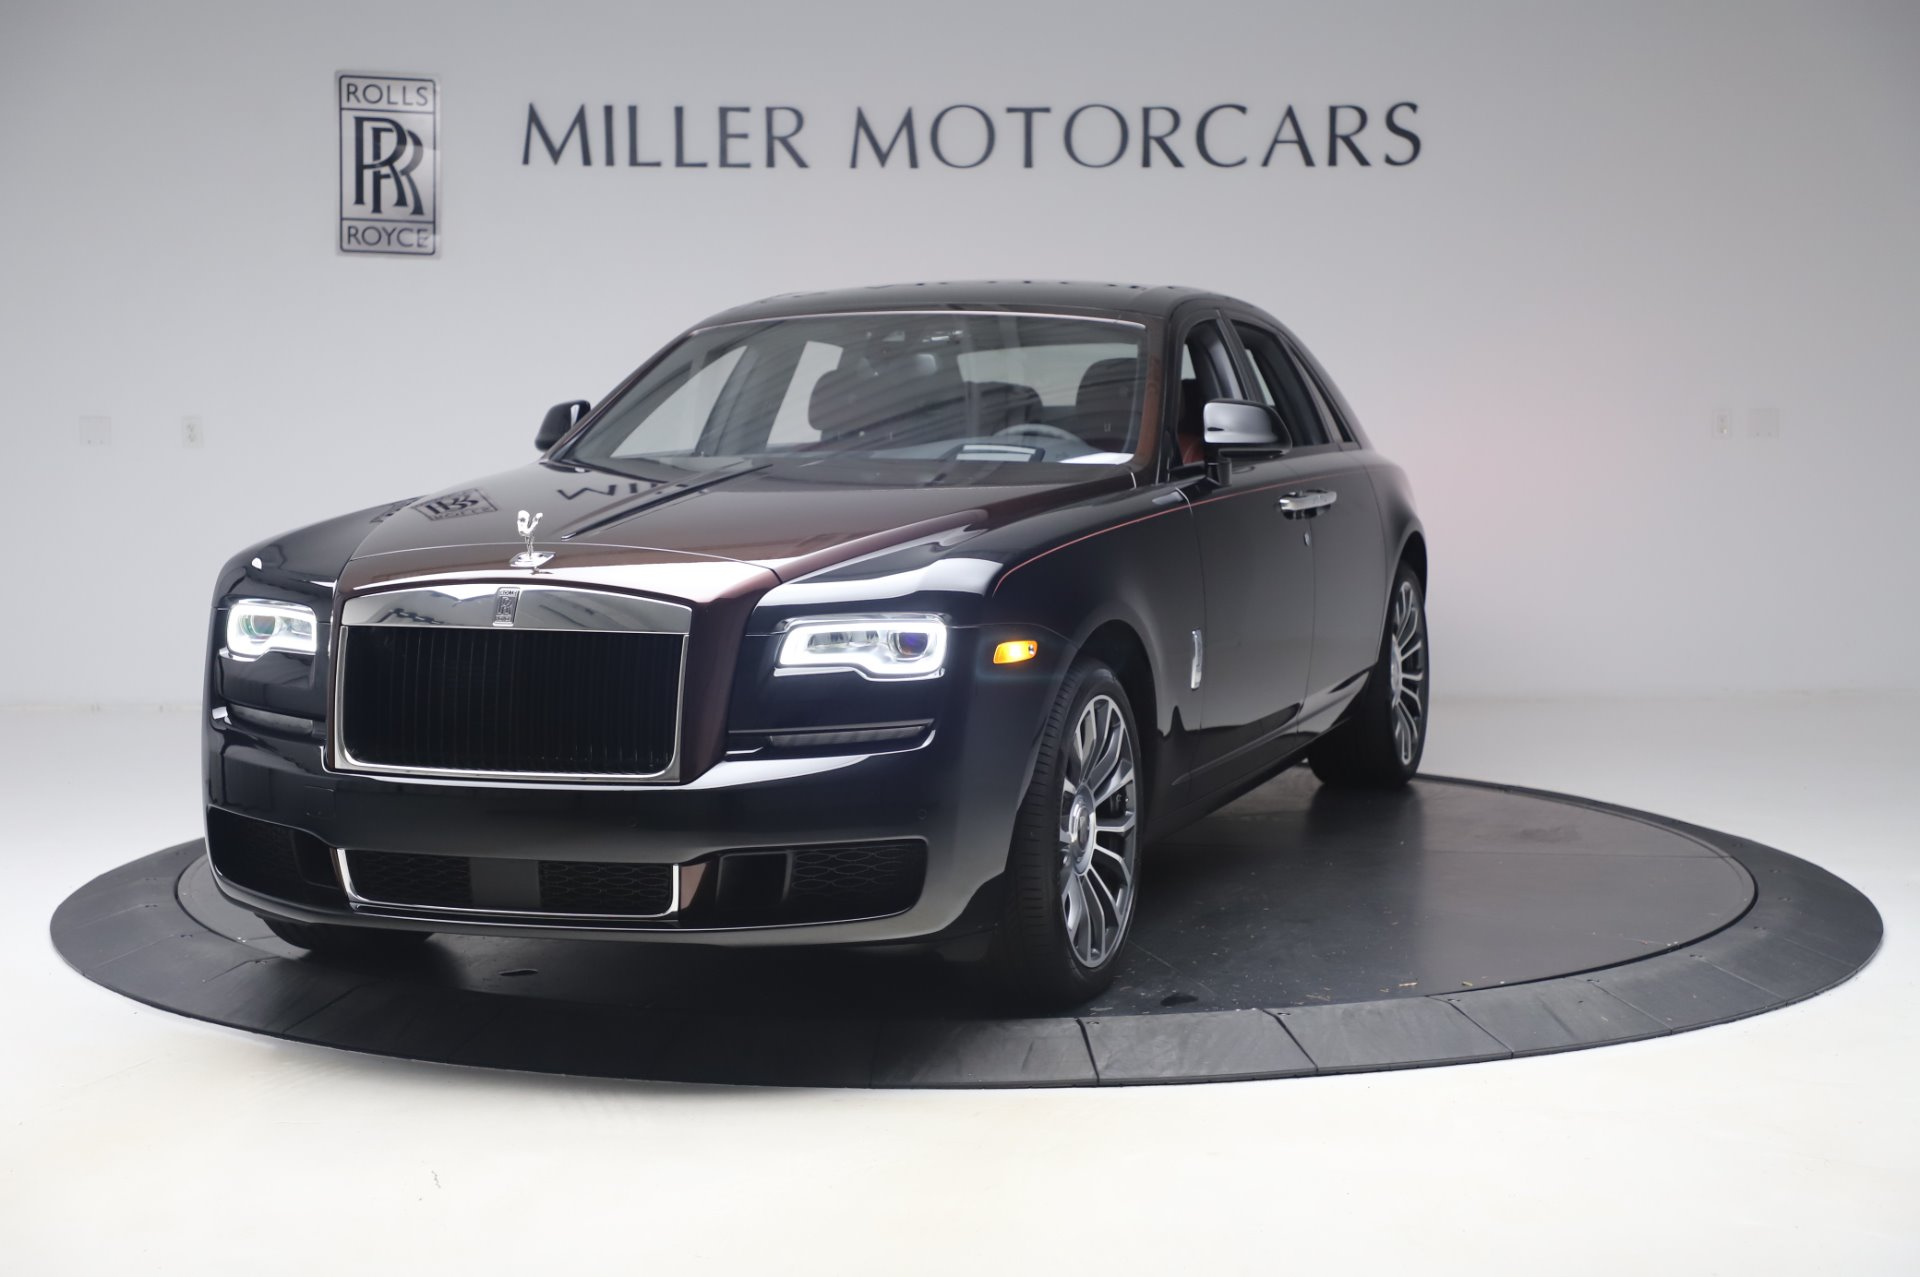 New 2020 Rolls-Royce Ghost for sale $450,450 at Rolls-Royce Motor Cars Greenwich in Greenwich CT 06830 1